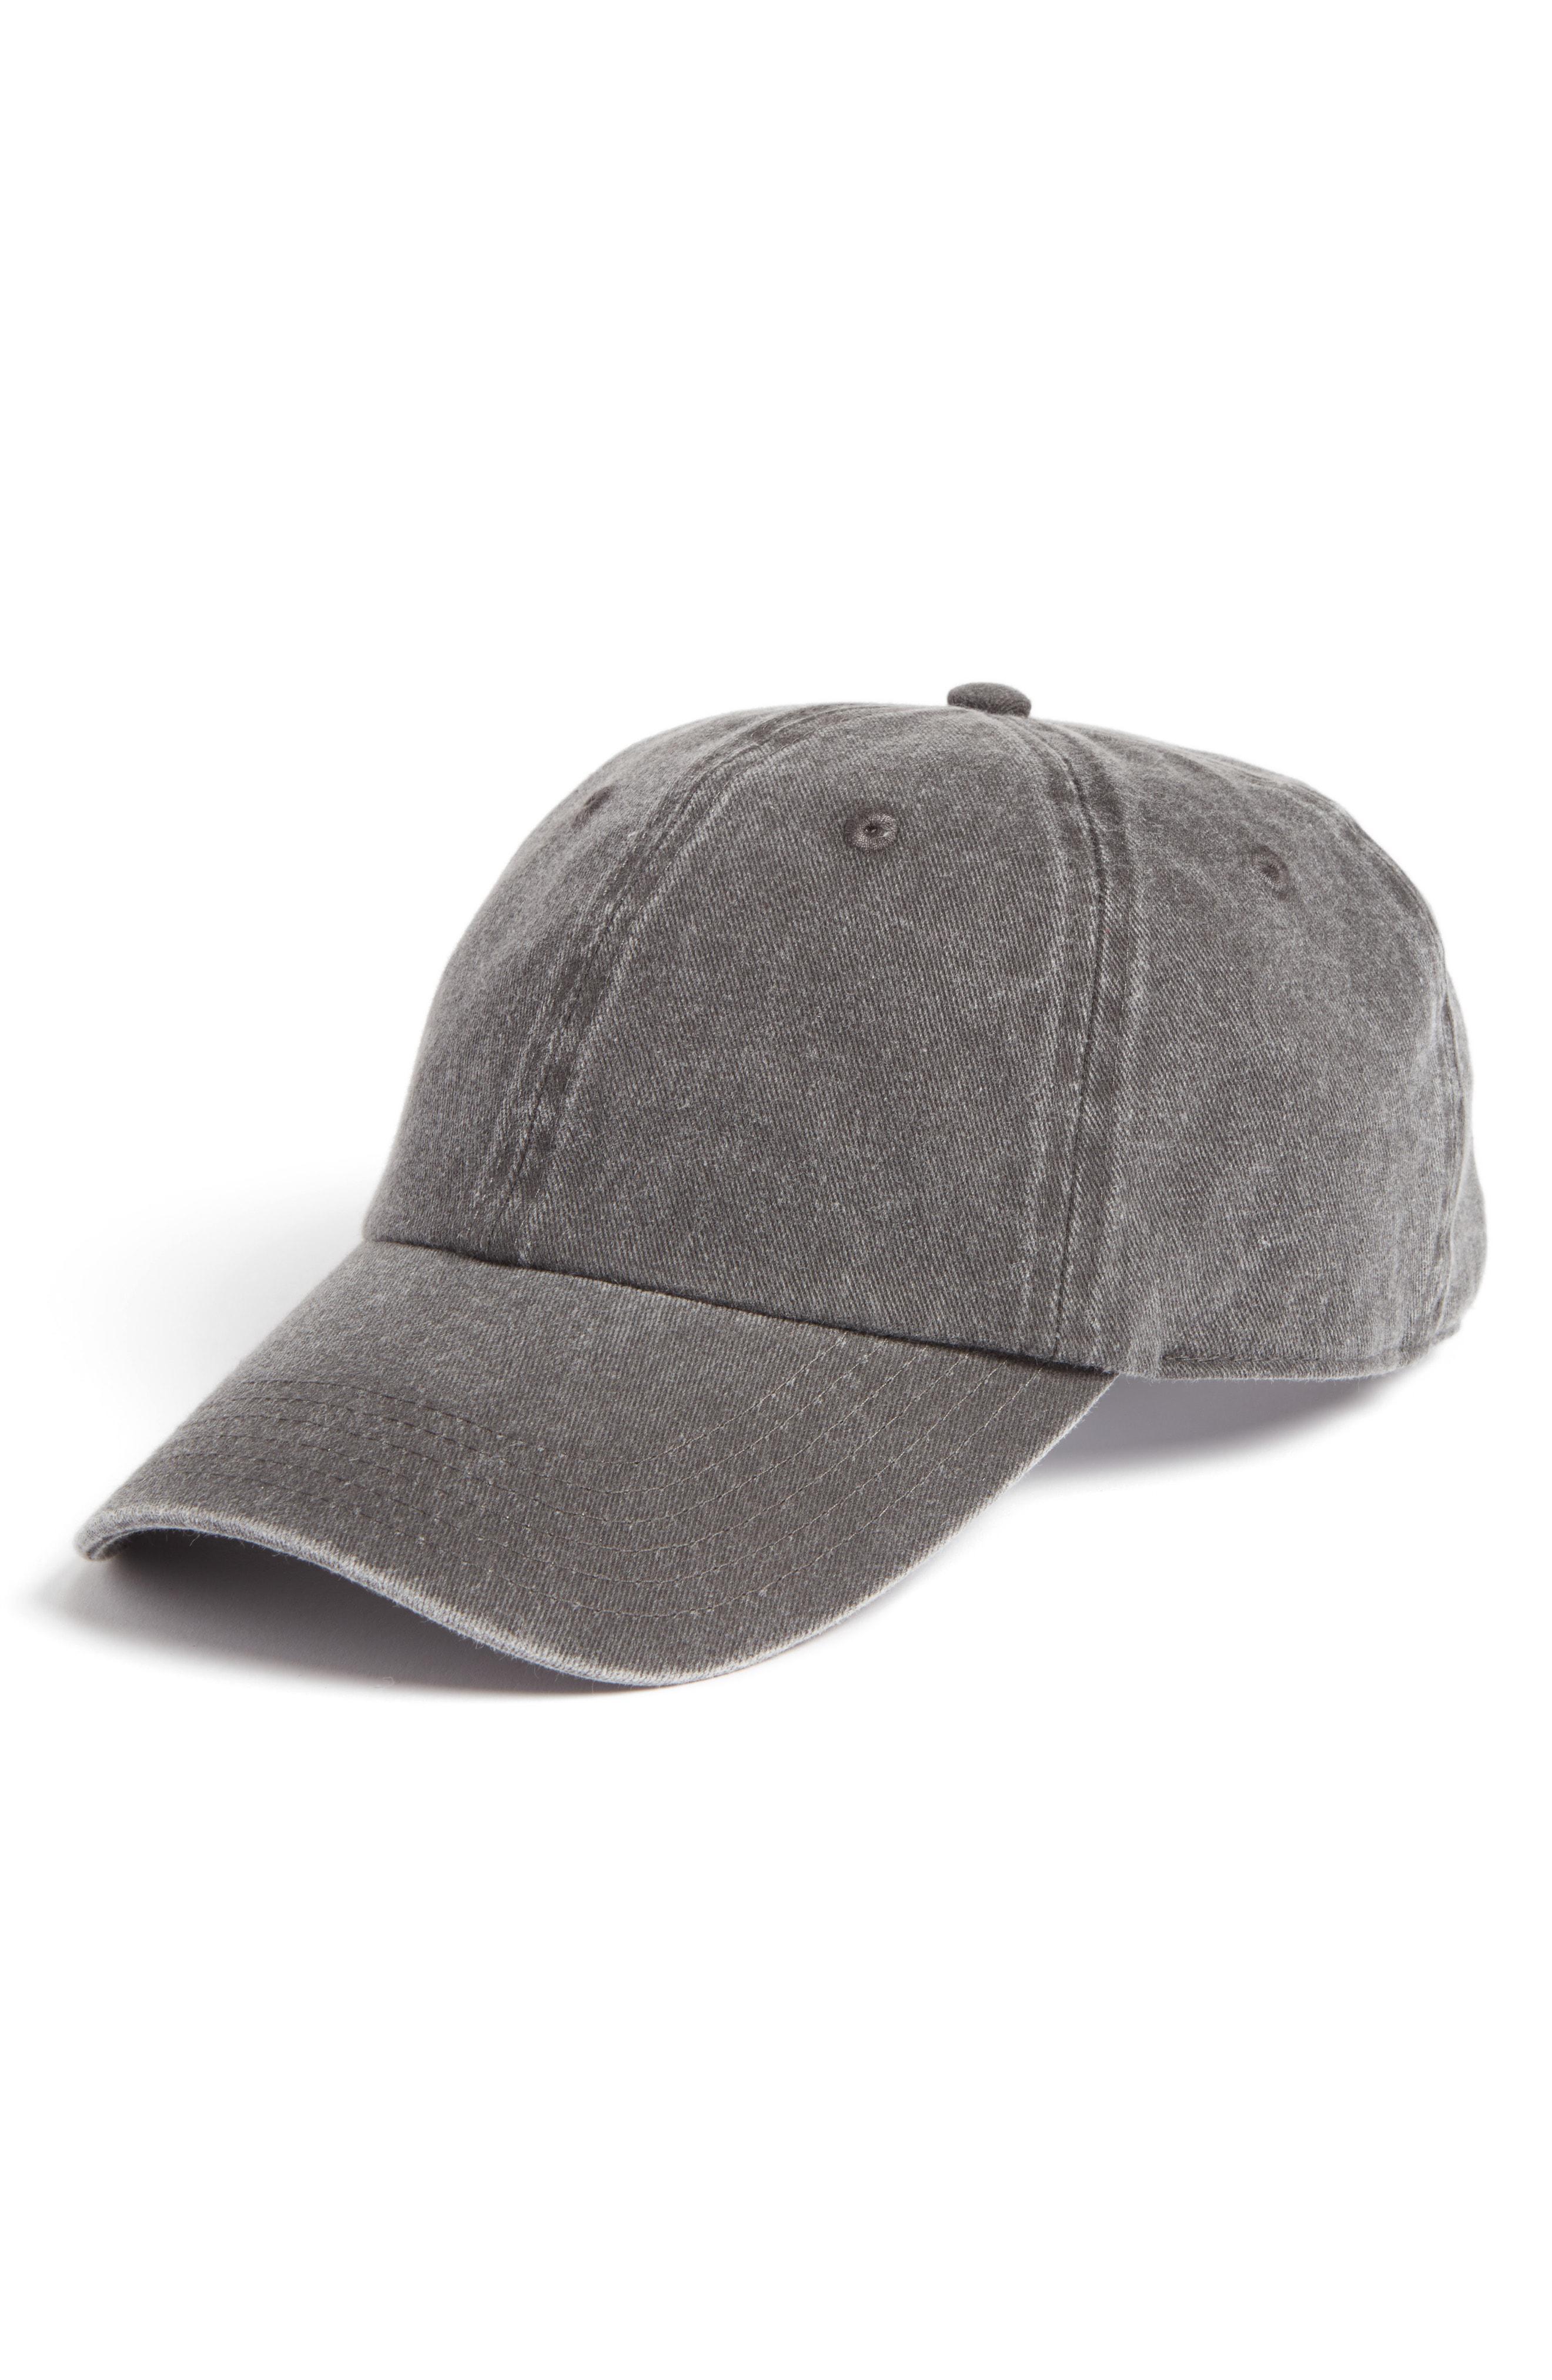 Lyst - Treasure   Bond Canvas Baseball Cap - in Gray b17156ebda6e